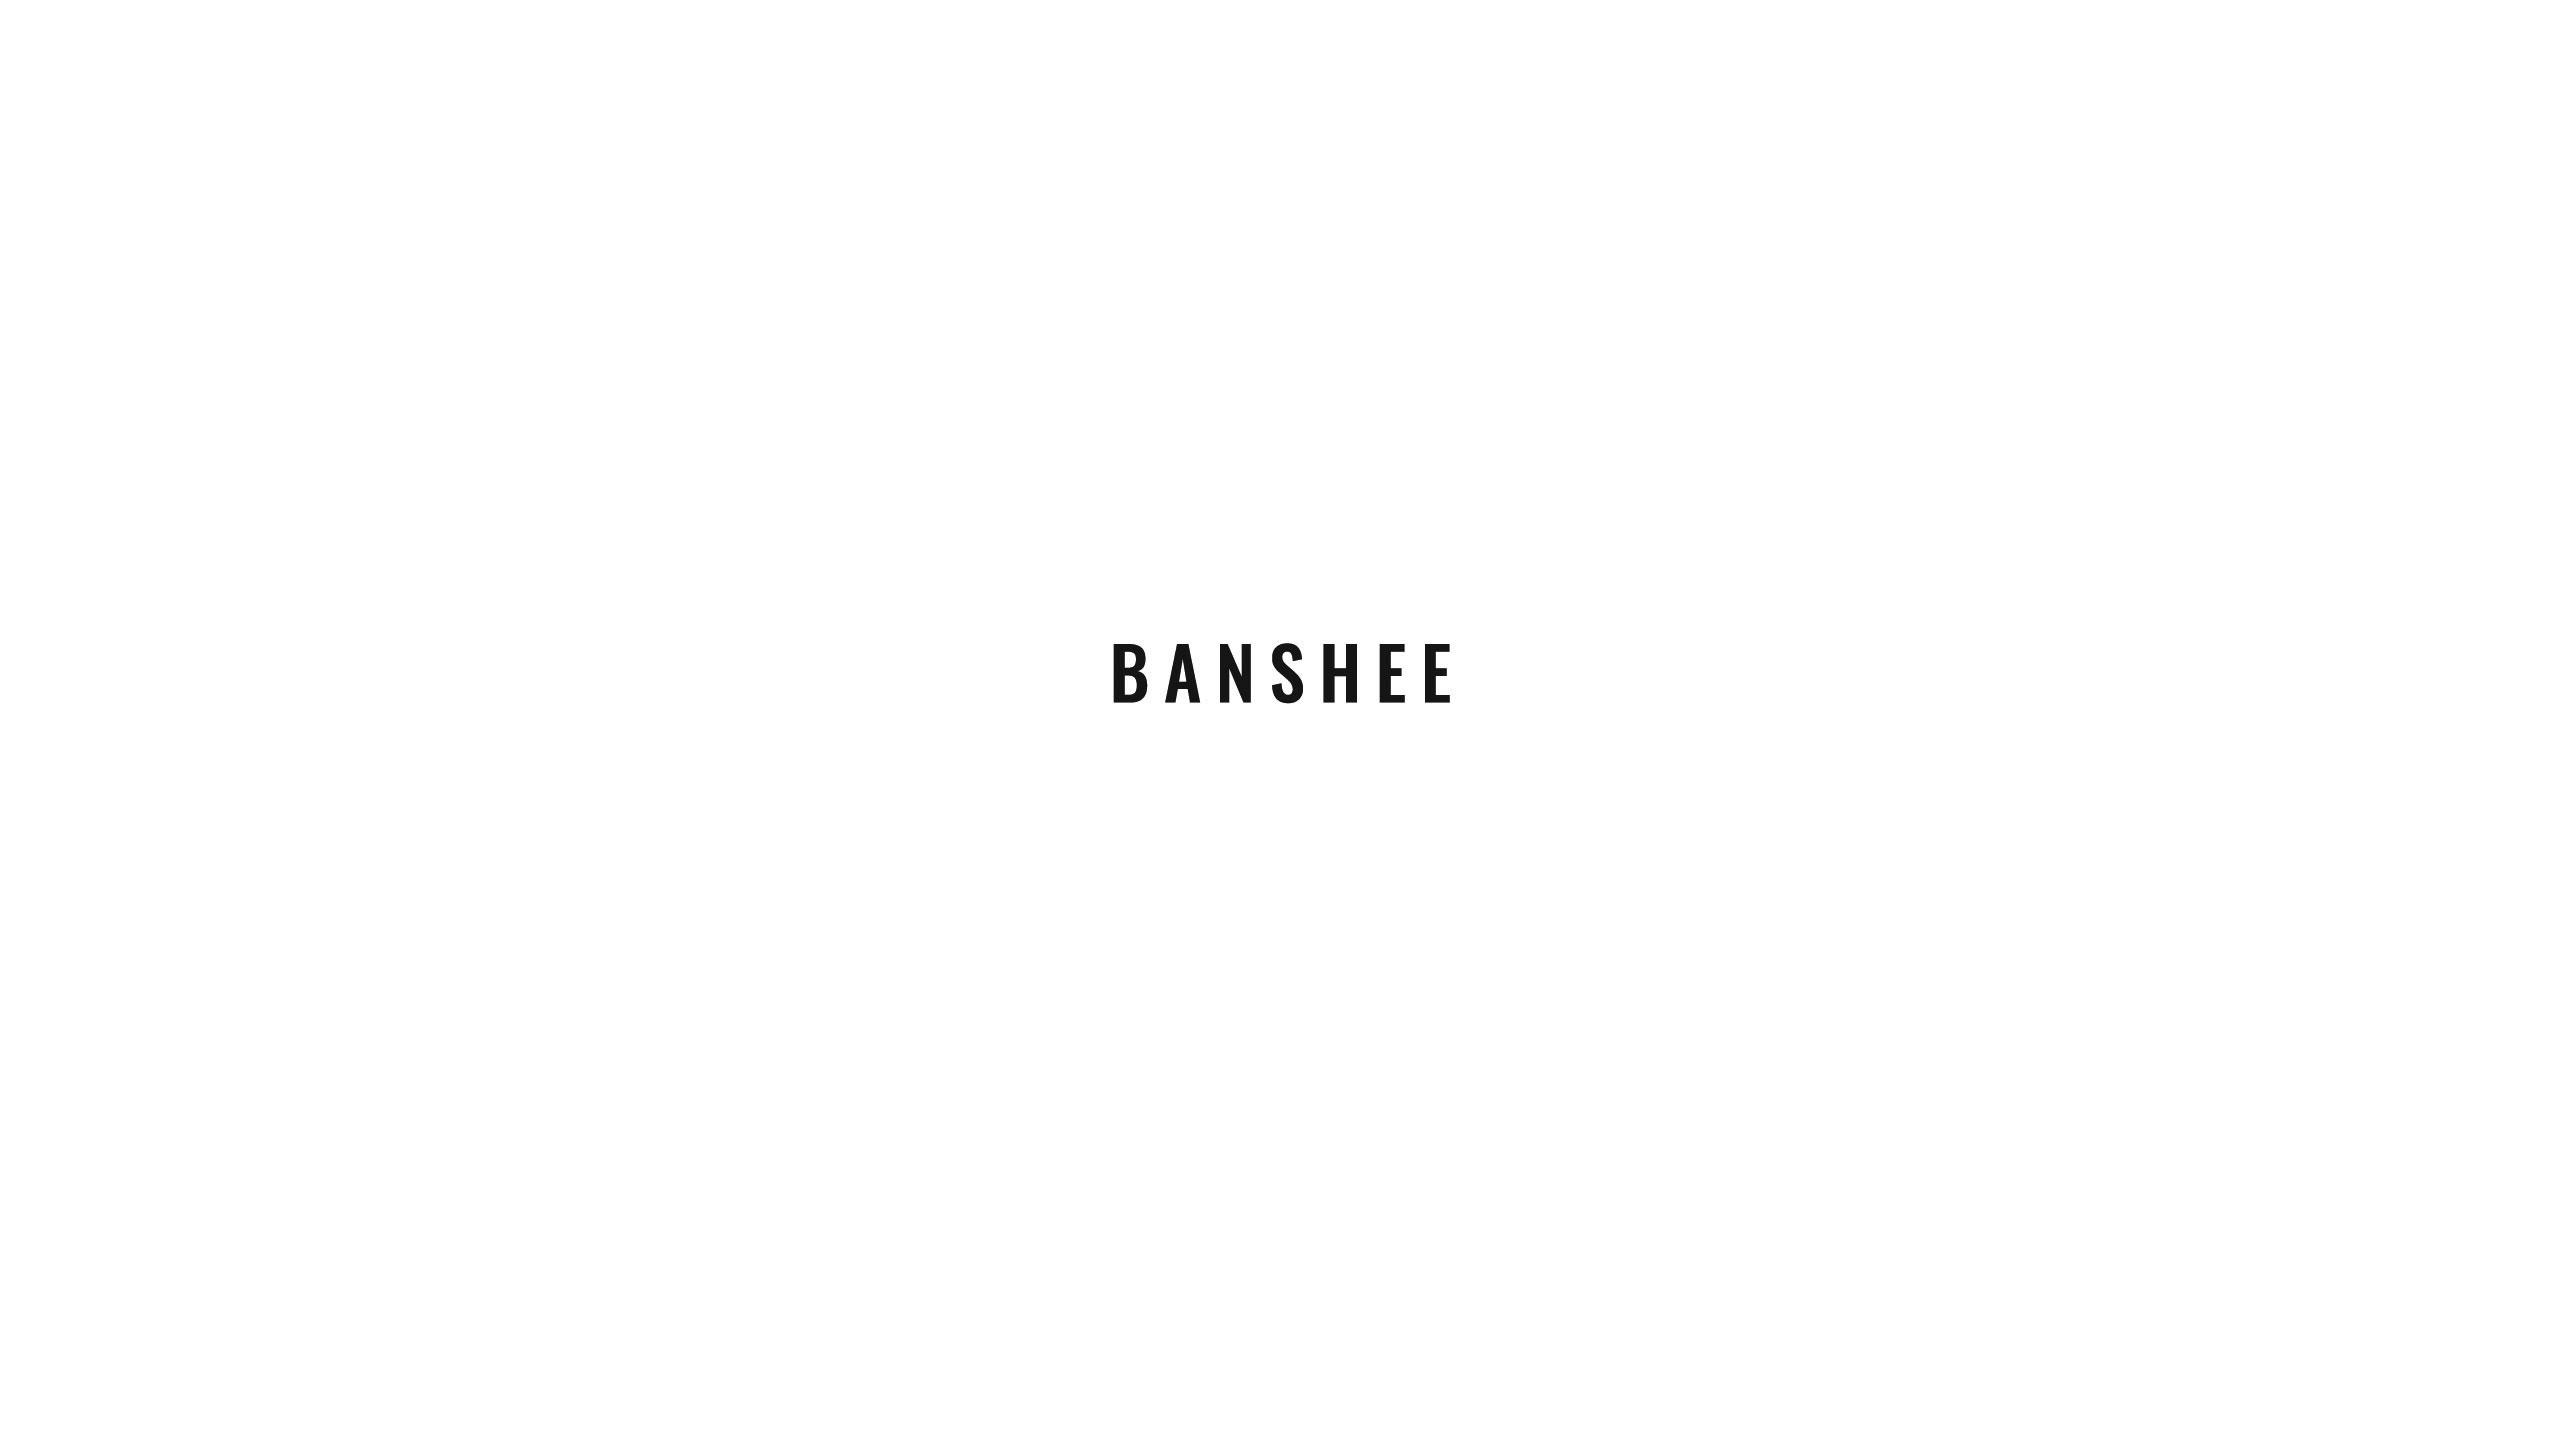 1a_Text_banshee